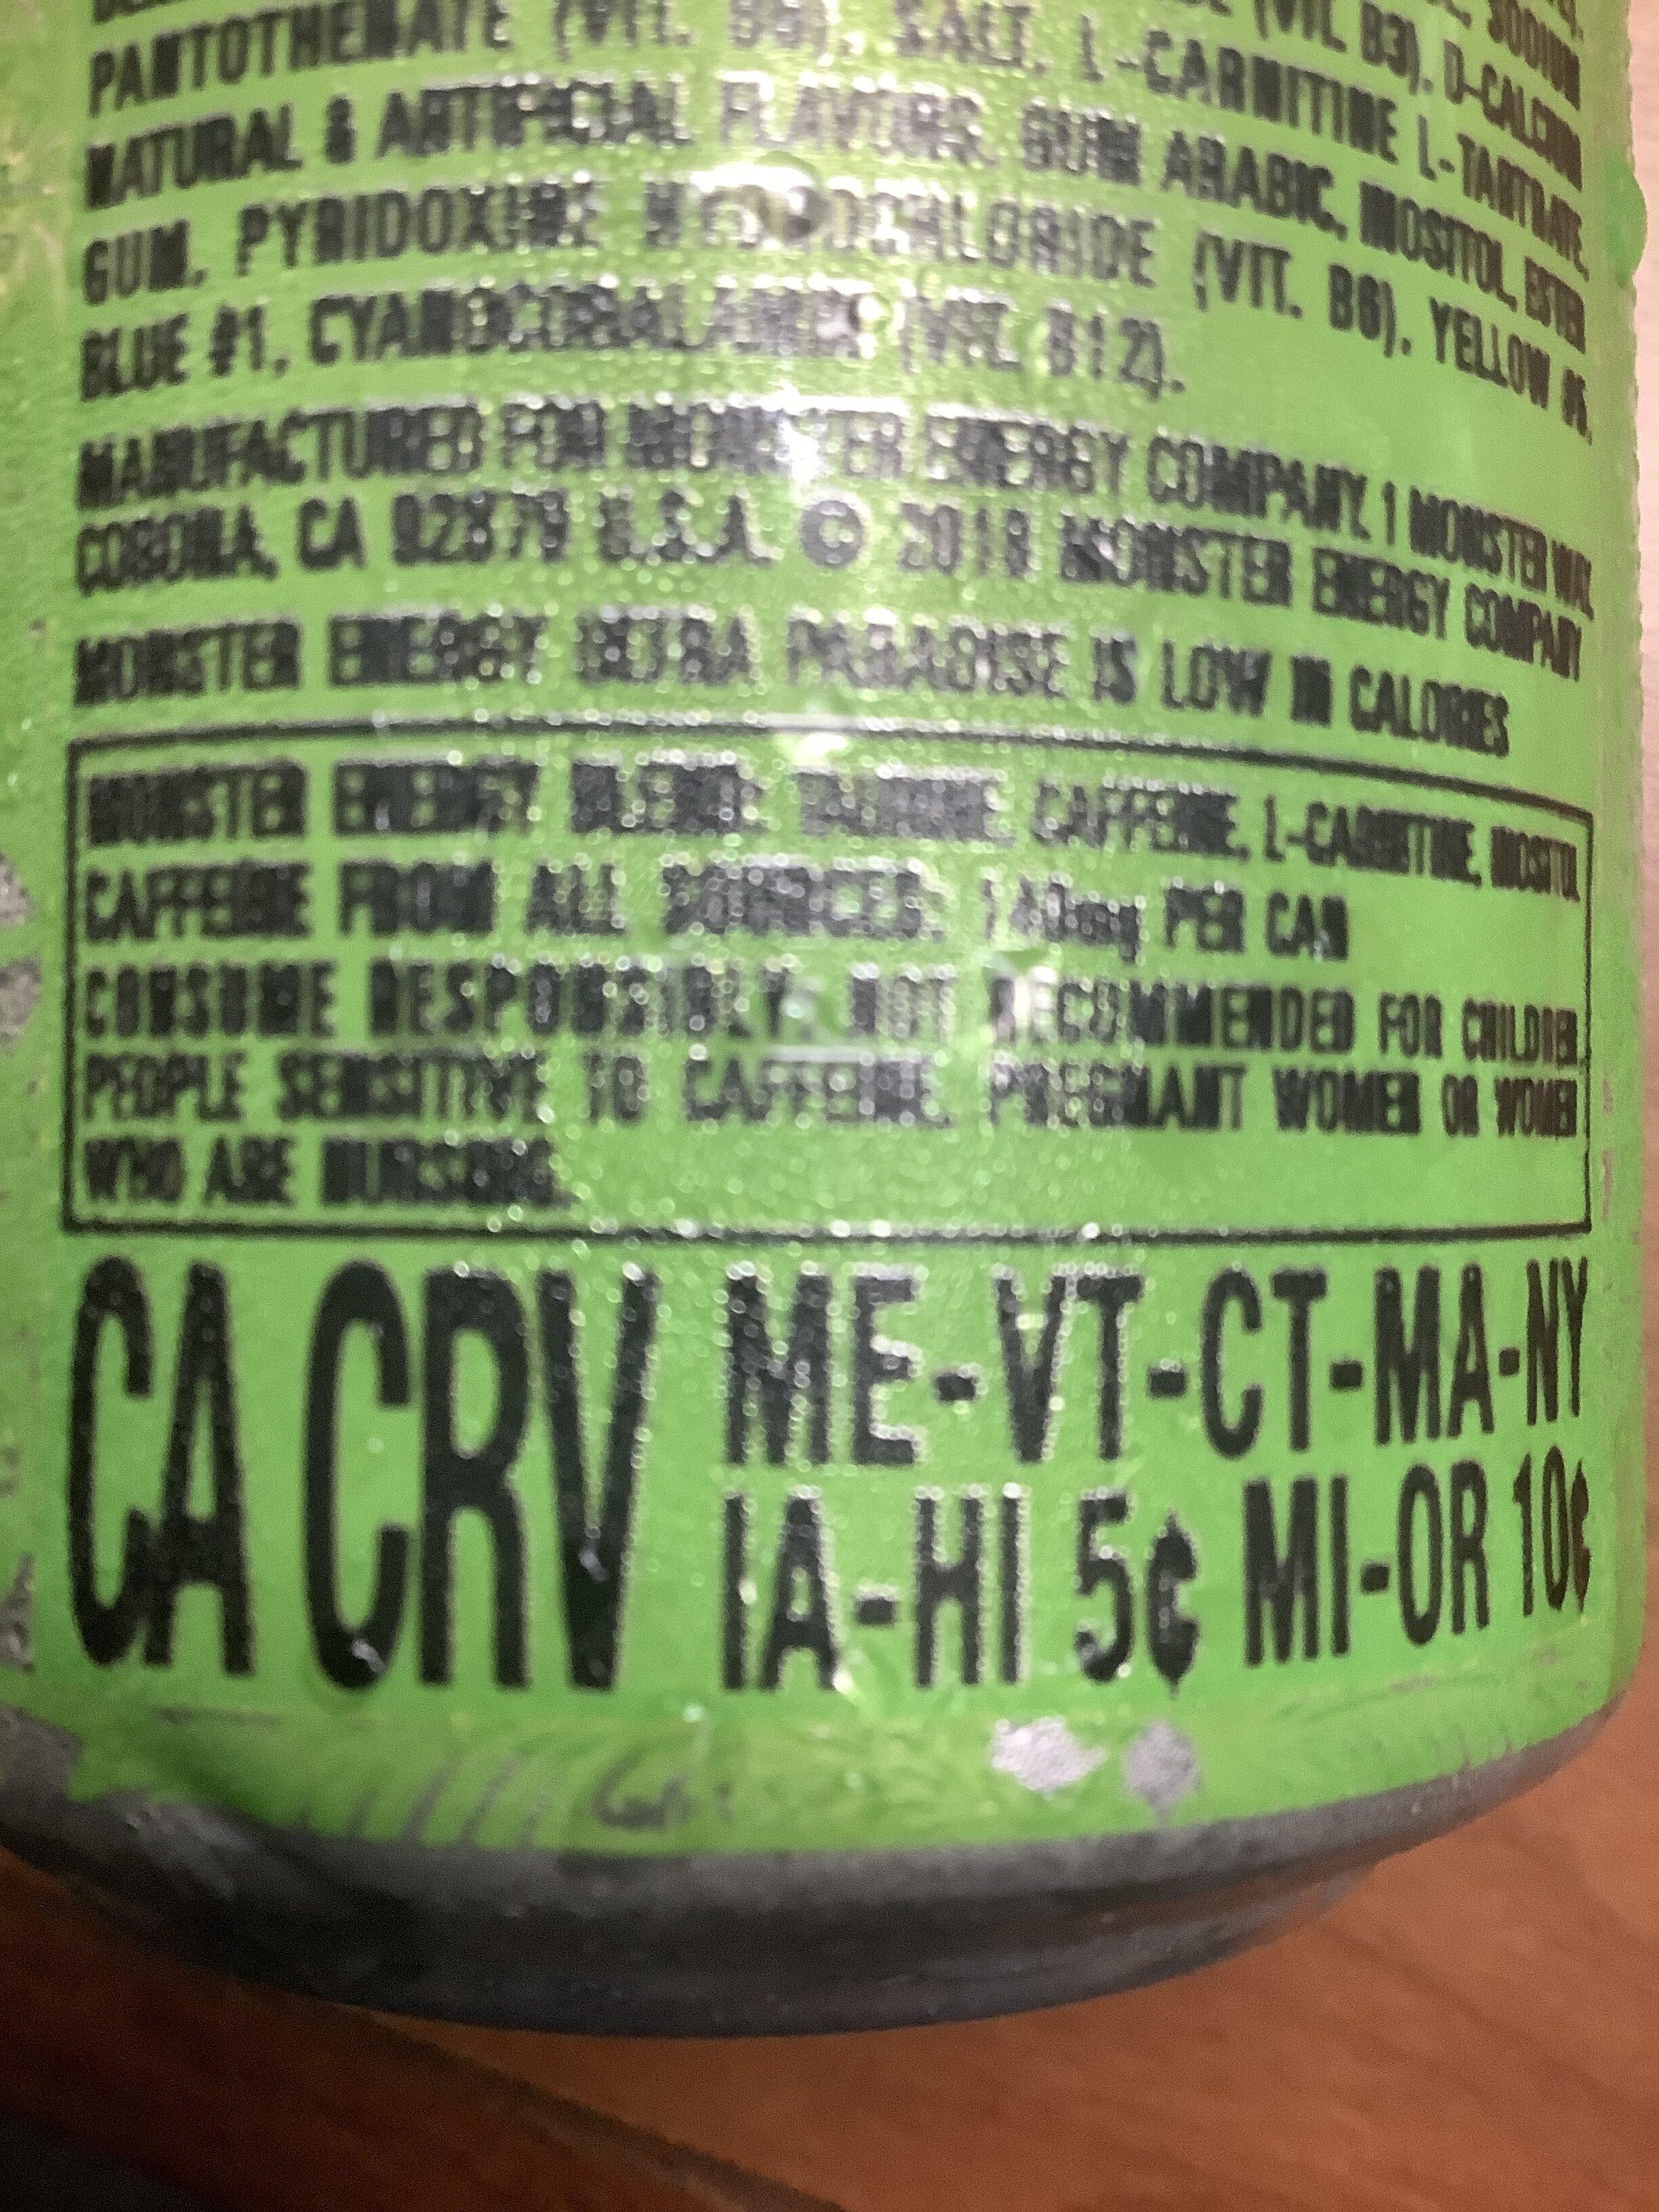 Monster ultra paradise energy drink - Instruction de recyclage et/ou informations d'emballage - en